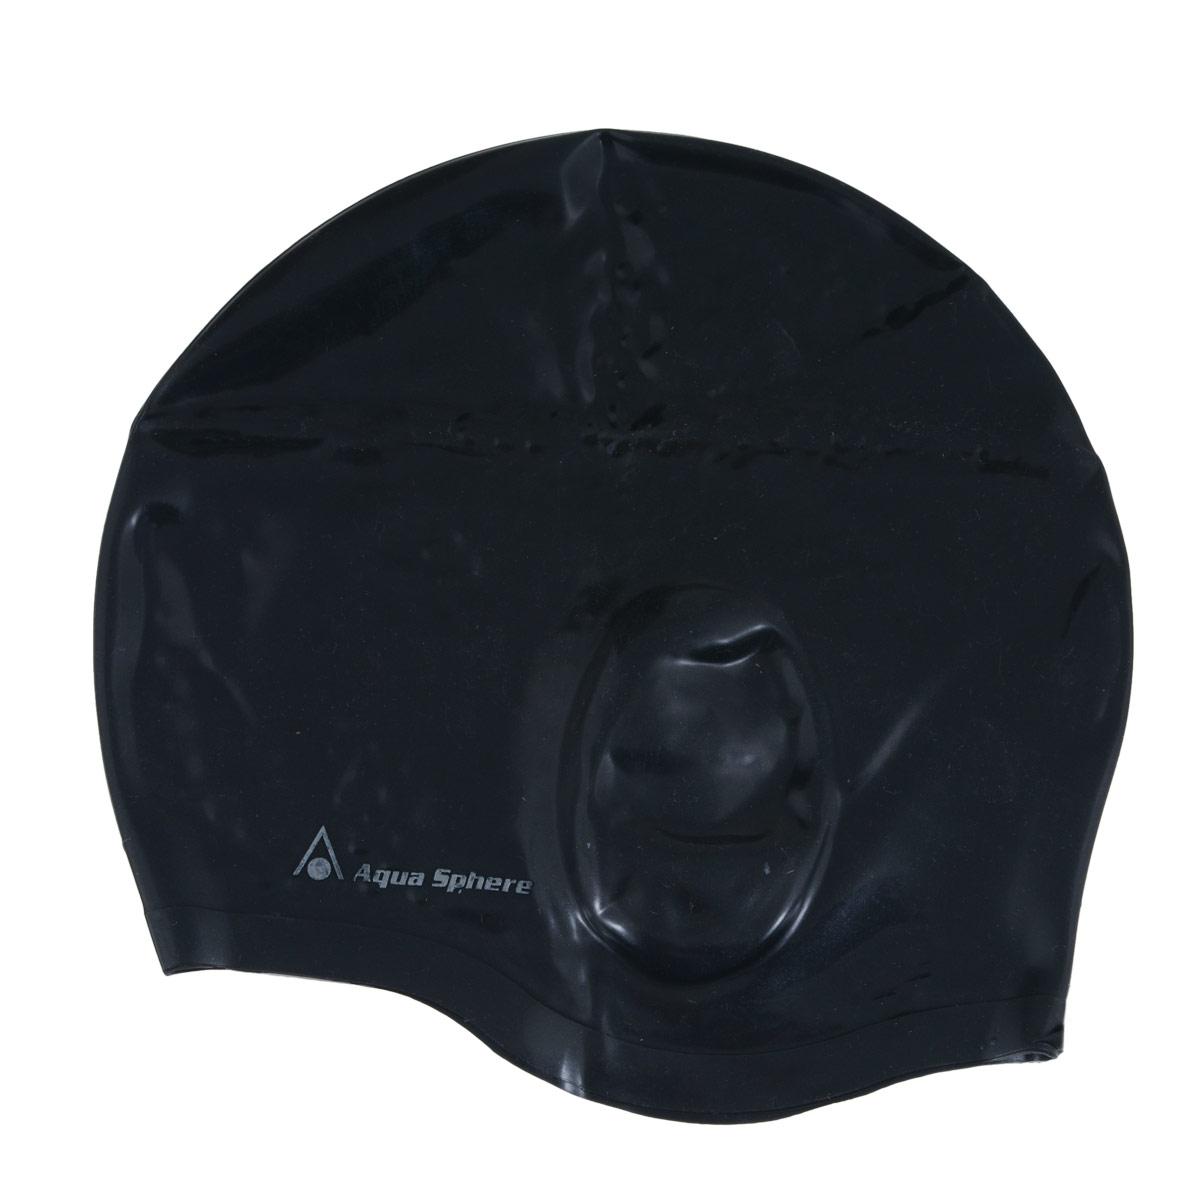 "Шапочка для плавания Aqua Sphere ""Aqua Glide"", цвет: черный"